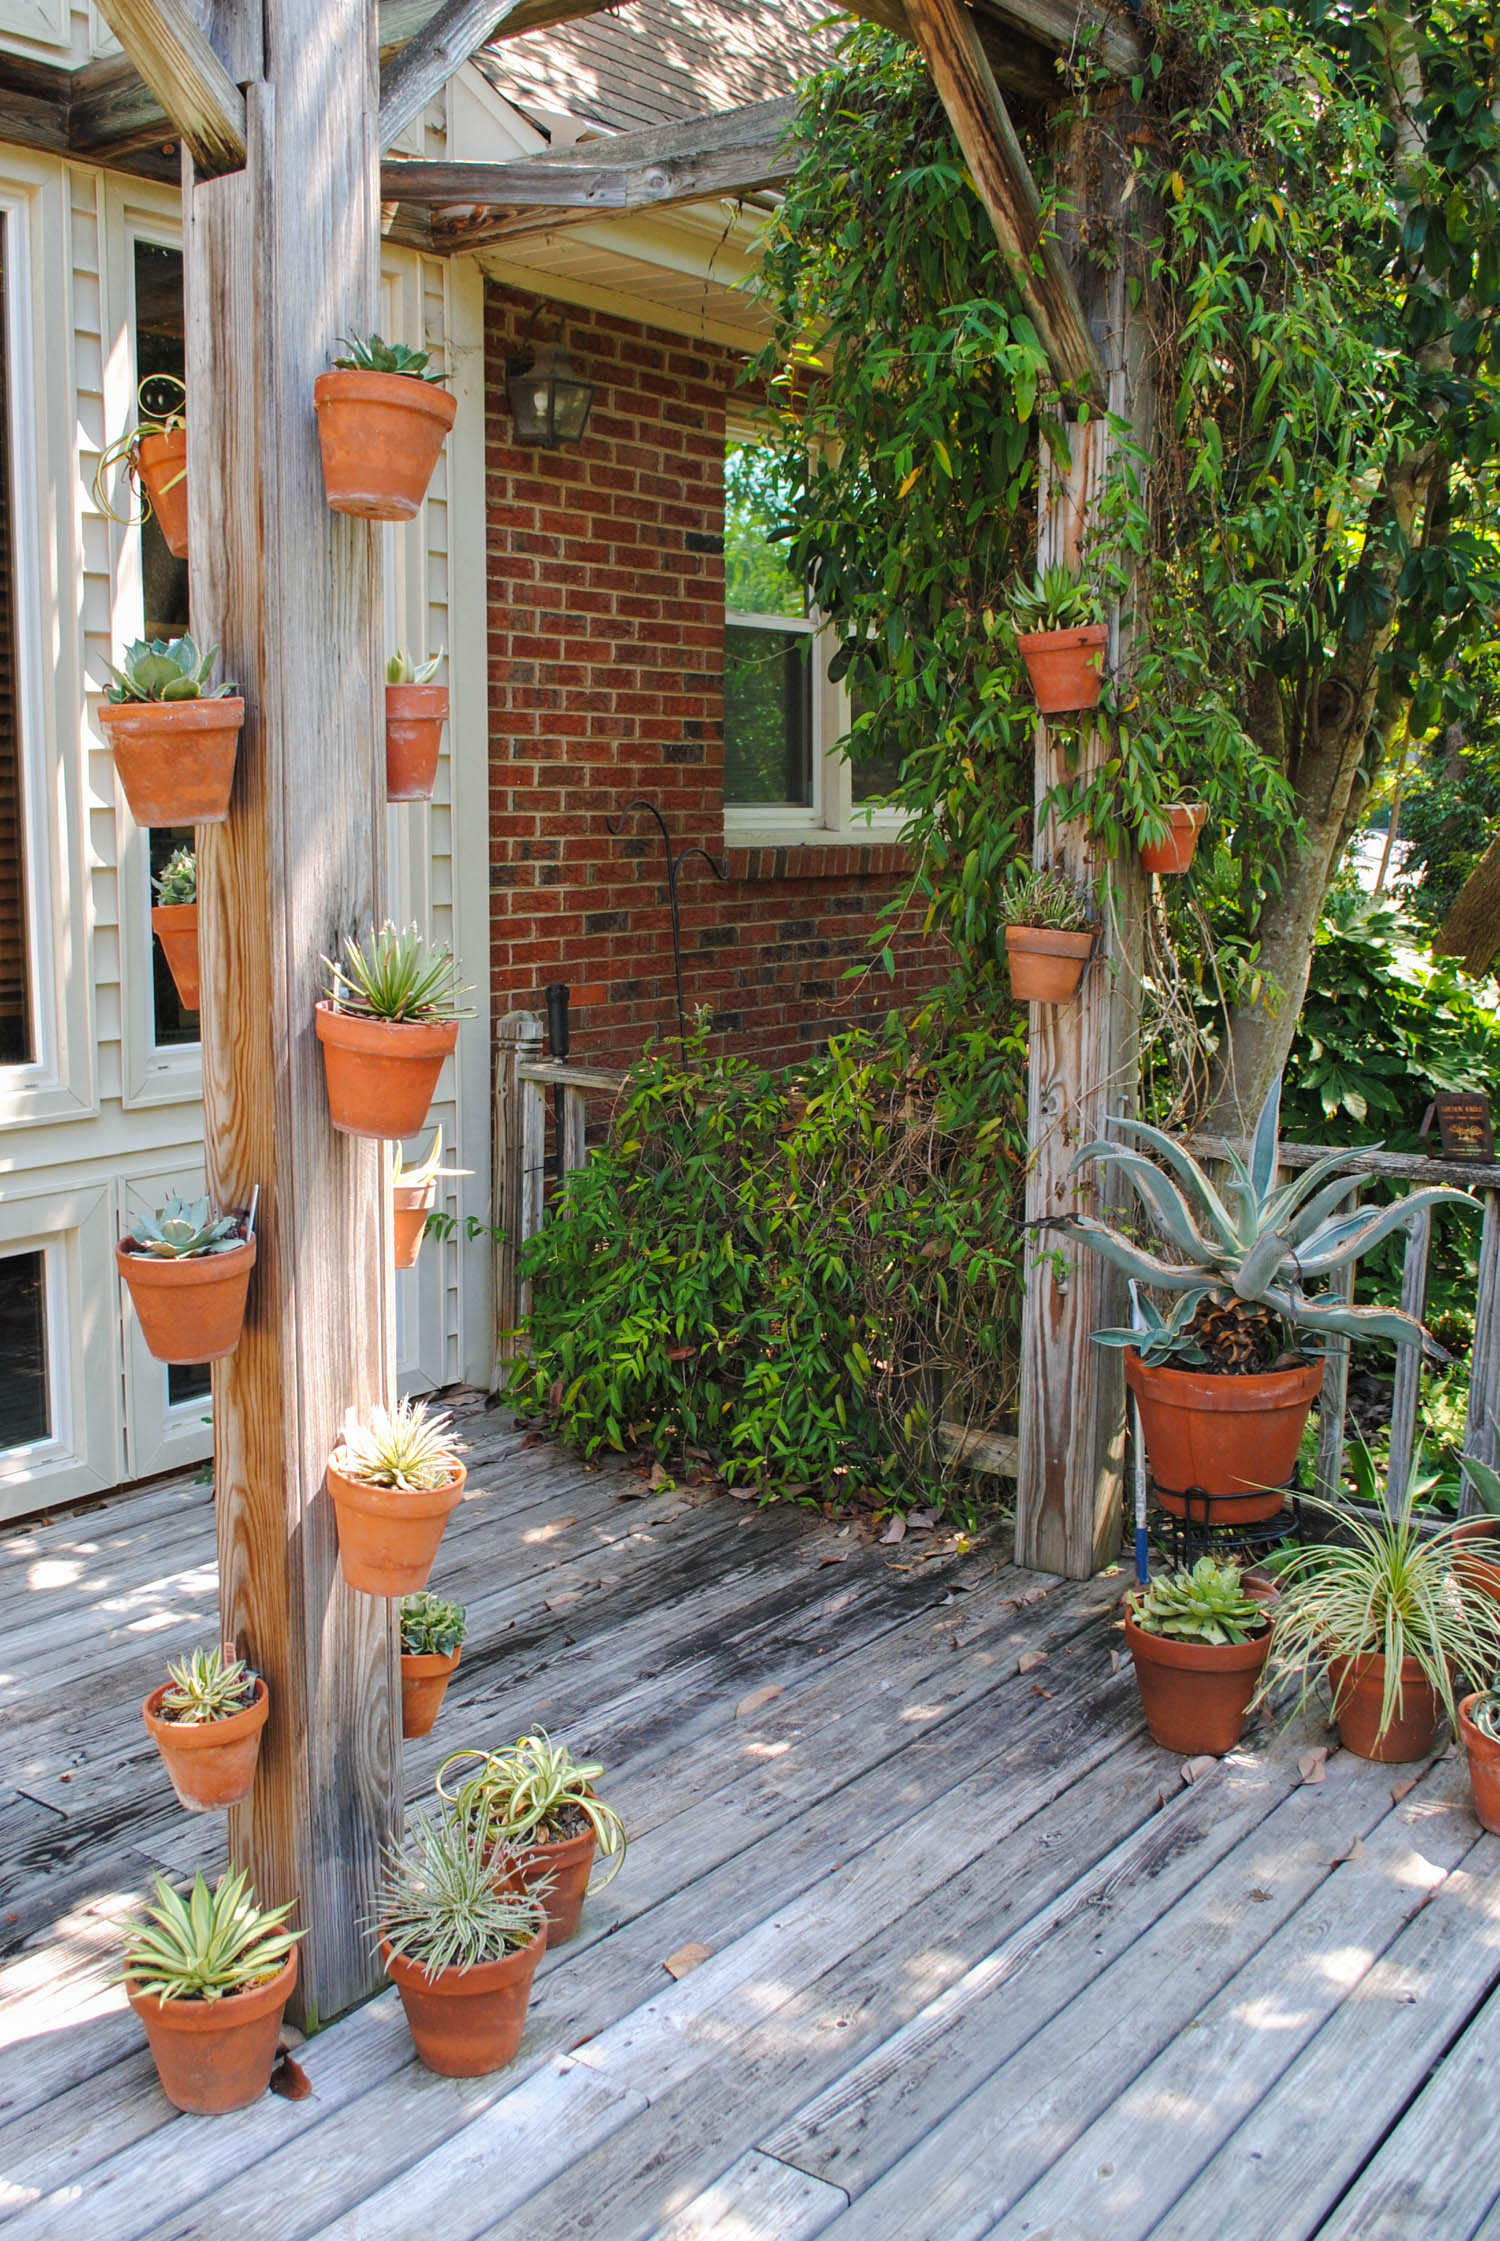 Terra cotta pots hang from posts at Juniper Level Botanic Garden.